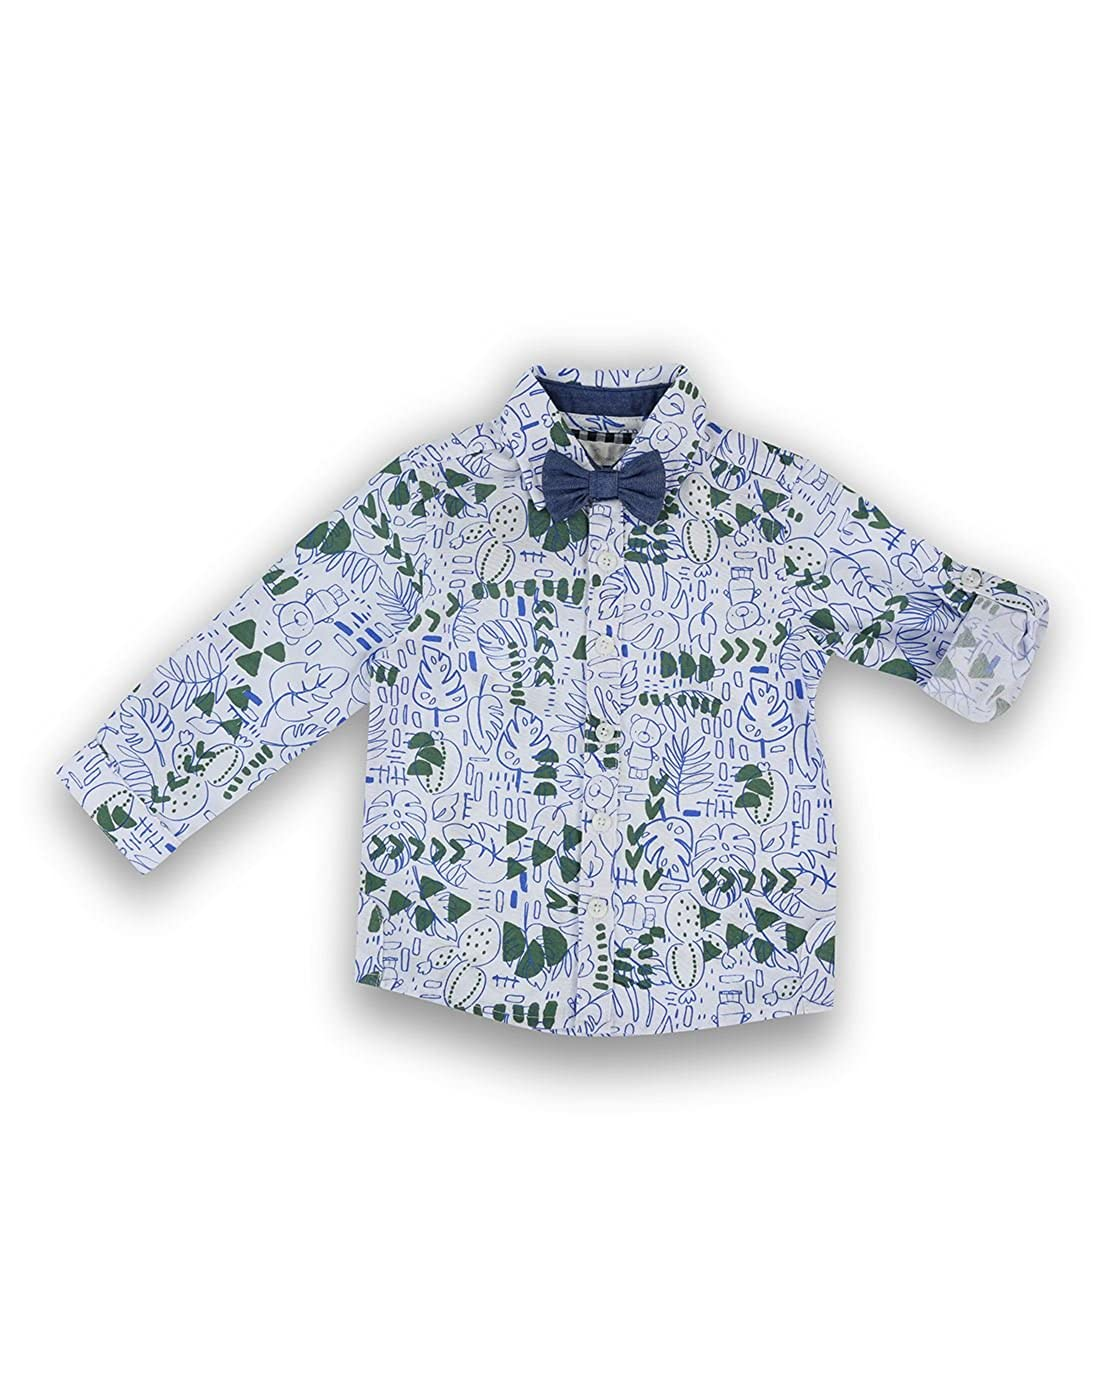 The Essential One - Bebé Infantil Niños Camisa Manga Larga Y ...